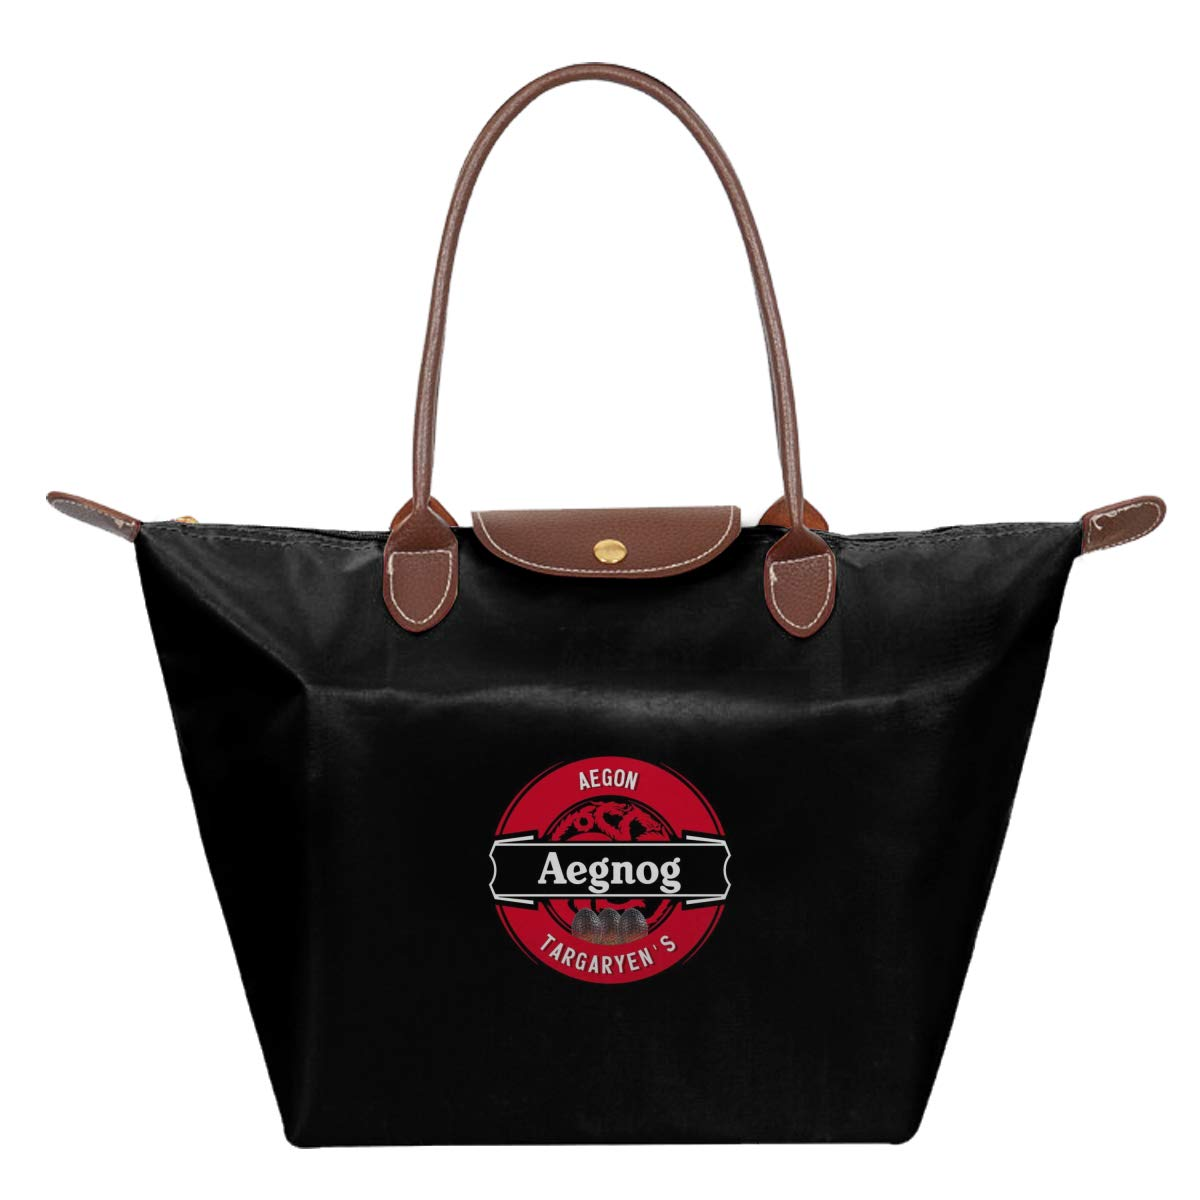 Aegon Targaryen Aegnog Game Of Thrones Waterproof Leather Folded Messenger Nylon Bag Travel Tote Hopping Folding School Handbags